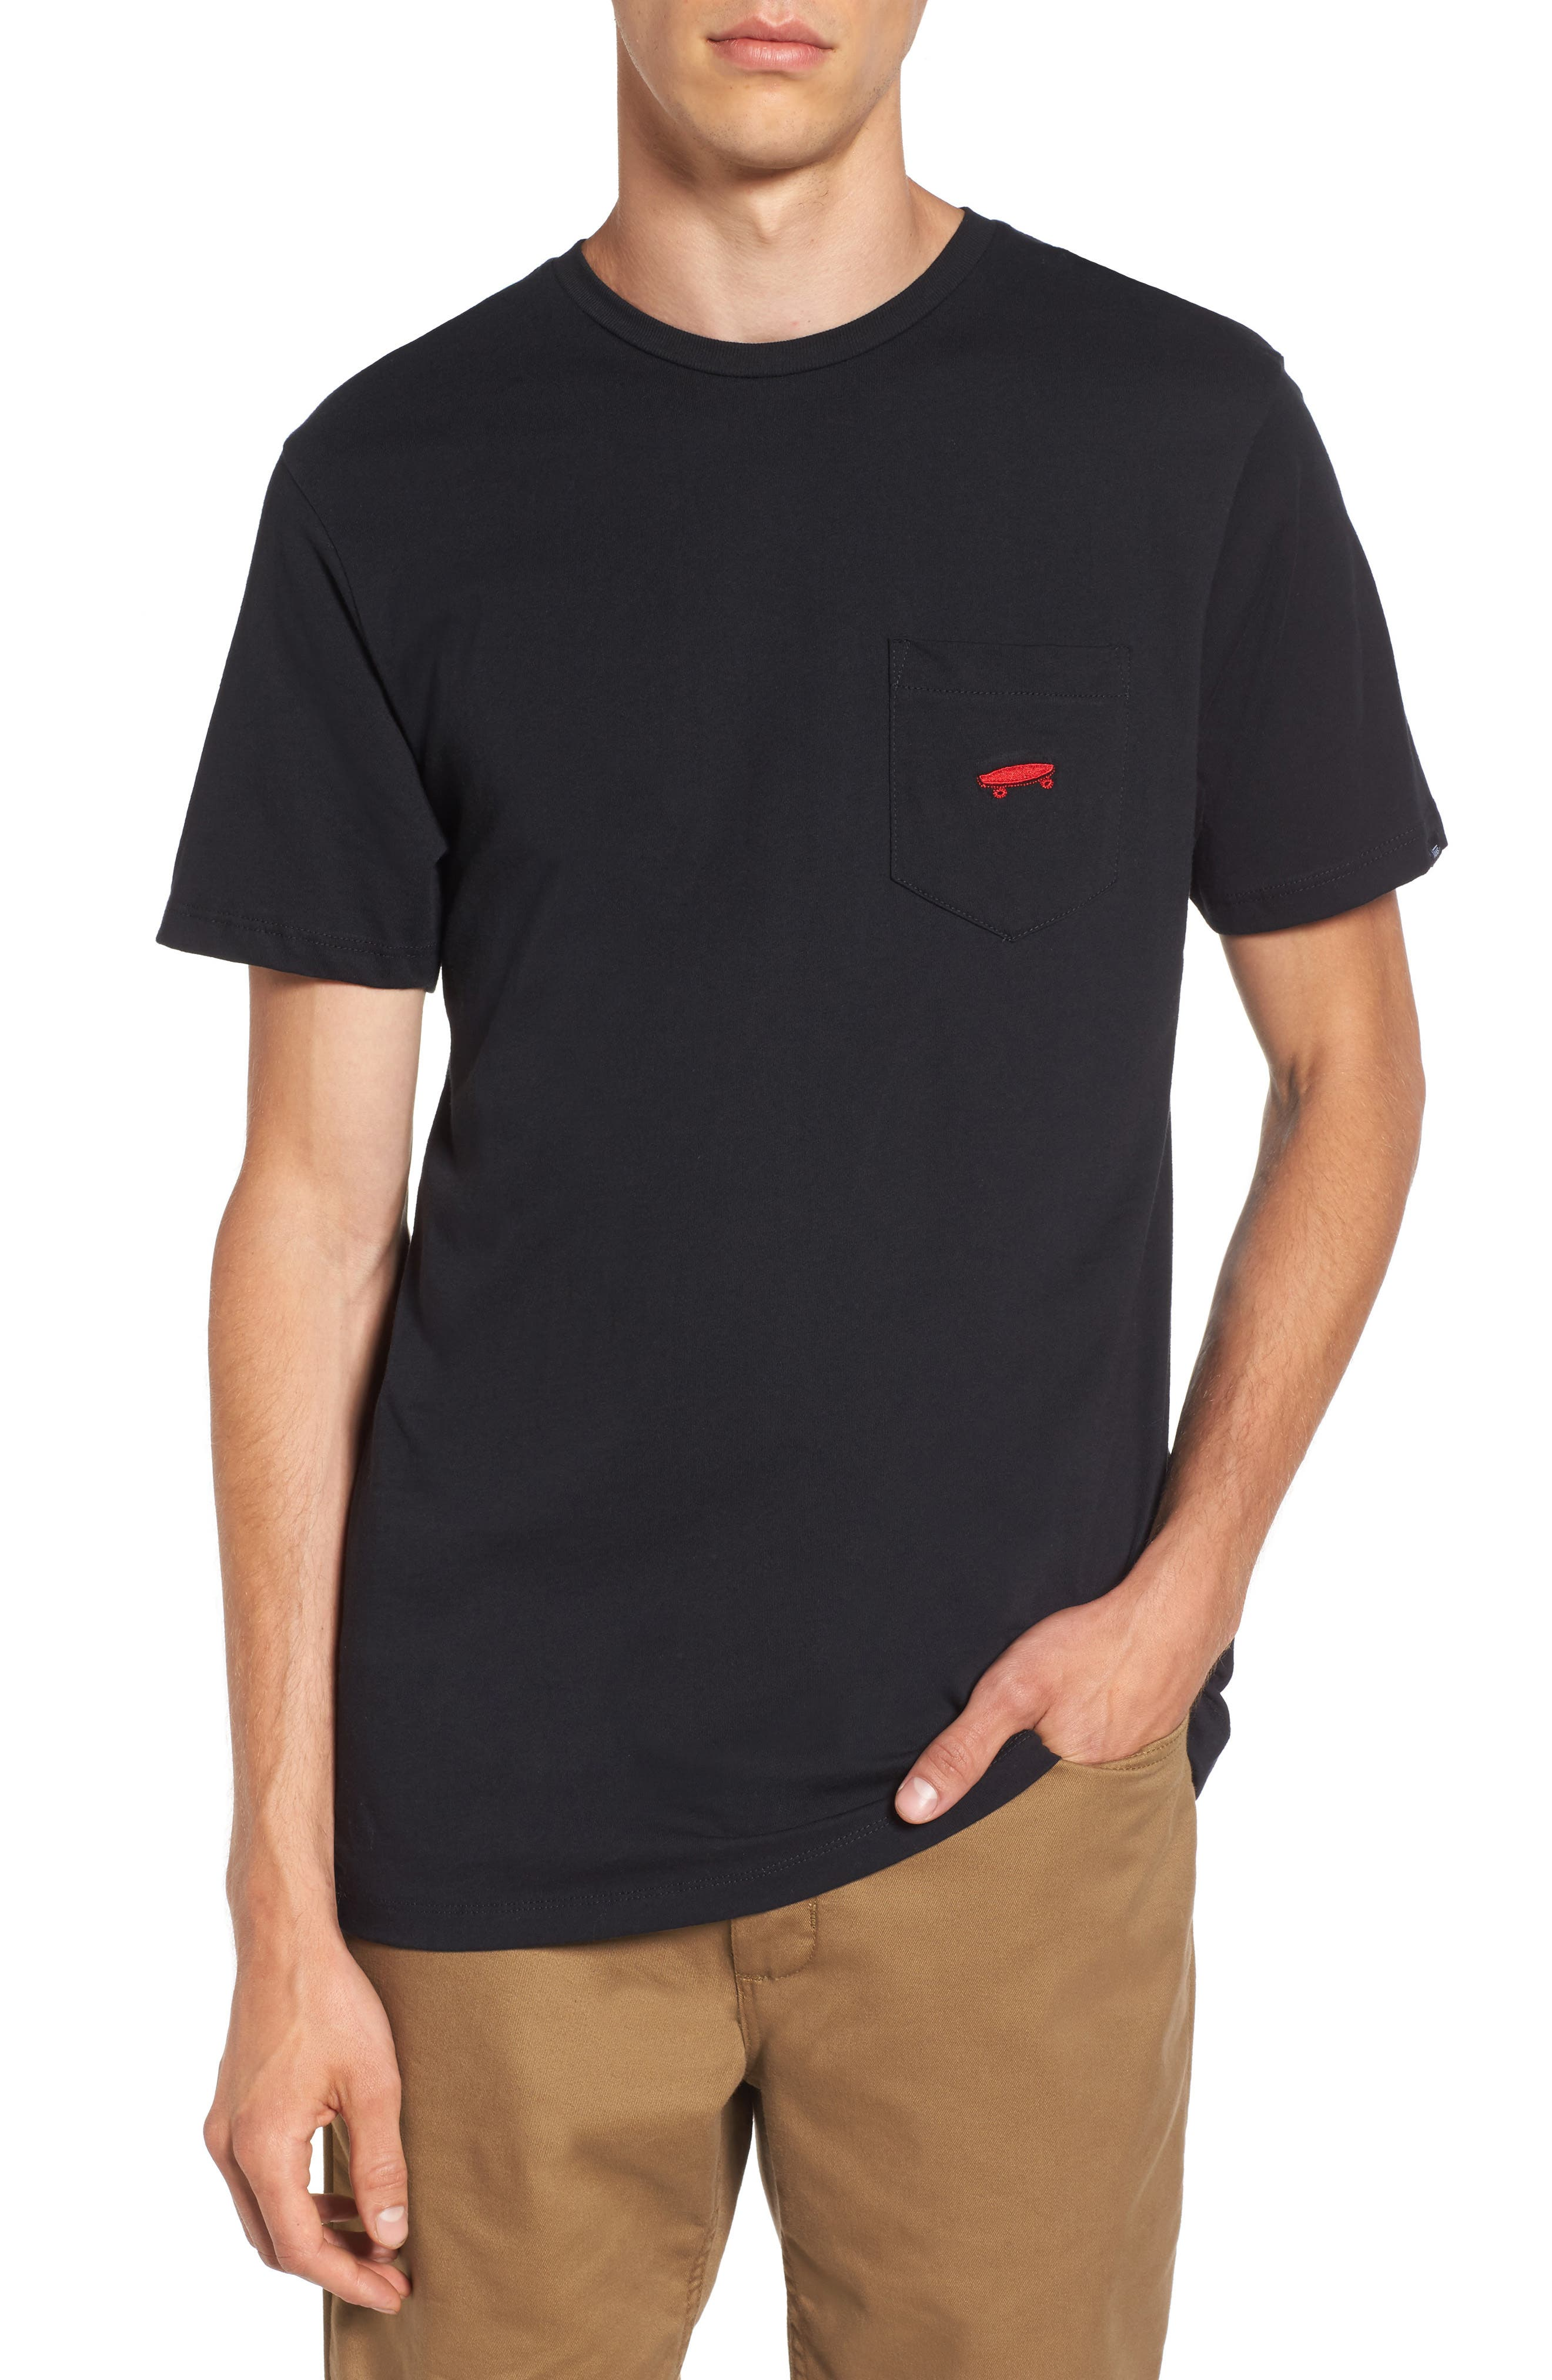 Alternate Image 1 Selected - Vans Everyday Embroidered Pocket T-Shirt